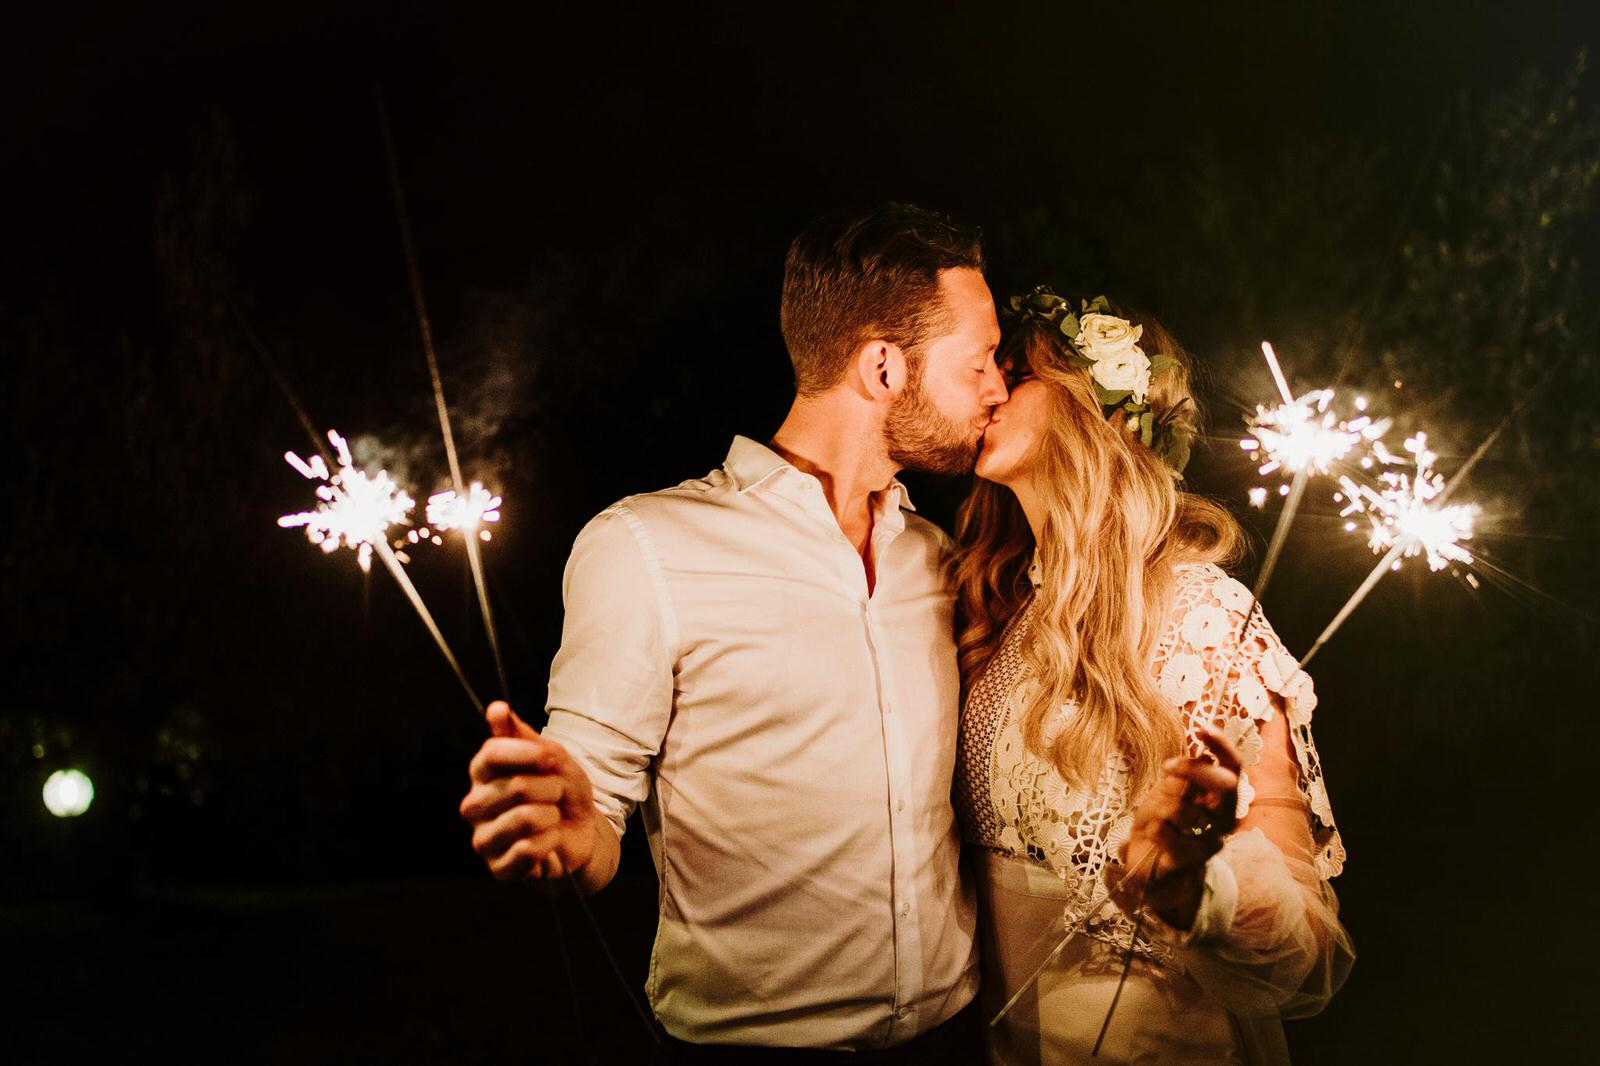 wedding photographer in italy-venice-tuscany-florence-amalfi coast-como lake-villa del balbianello-siena-amalfi-ravello-belmond-villa cimbrone74